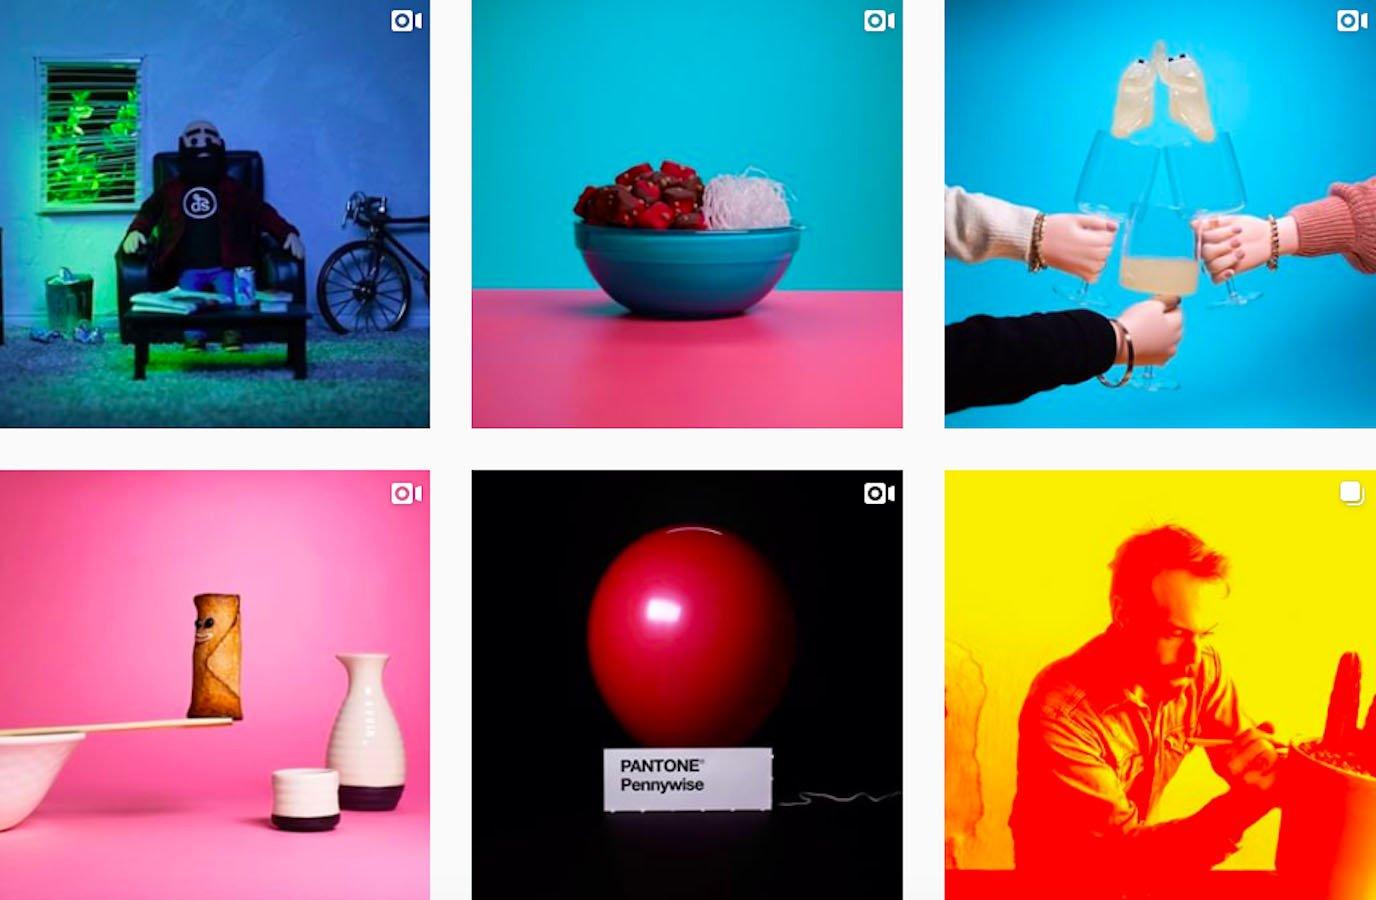 Web Design Inspiration: 110+ Accounts On Instagram and 10+ Best UX & Web Design Books in 2020 - dschwen